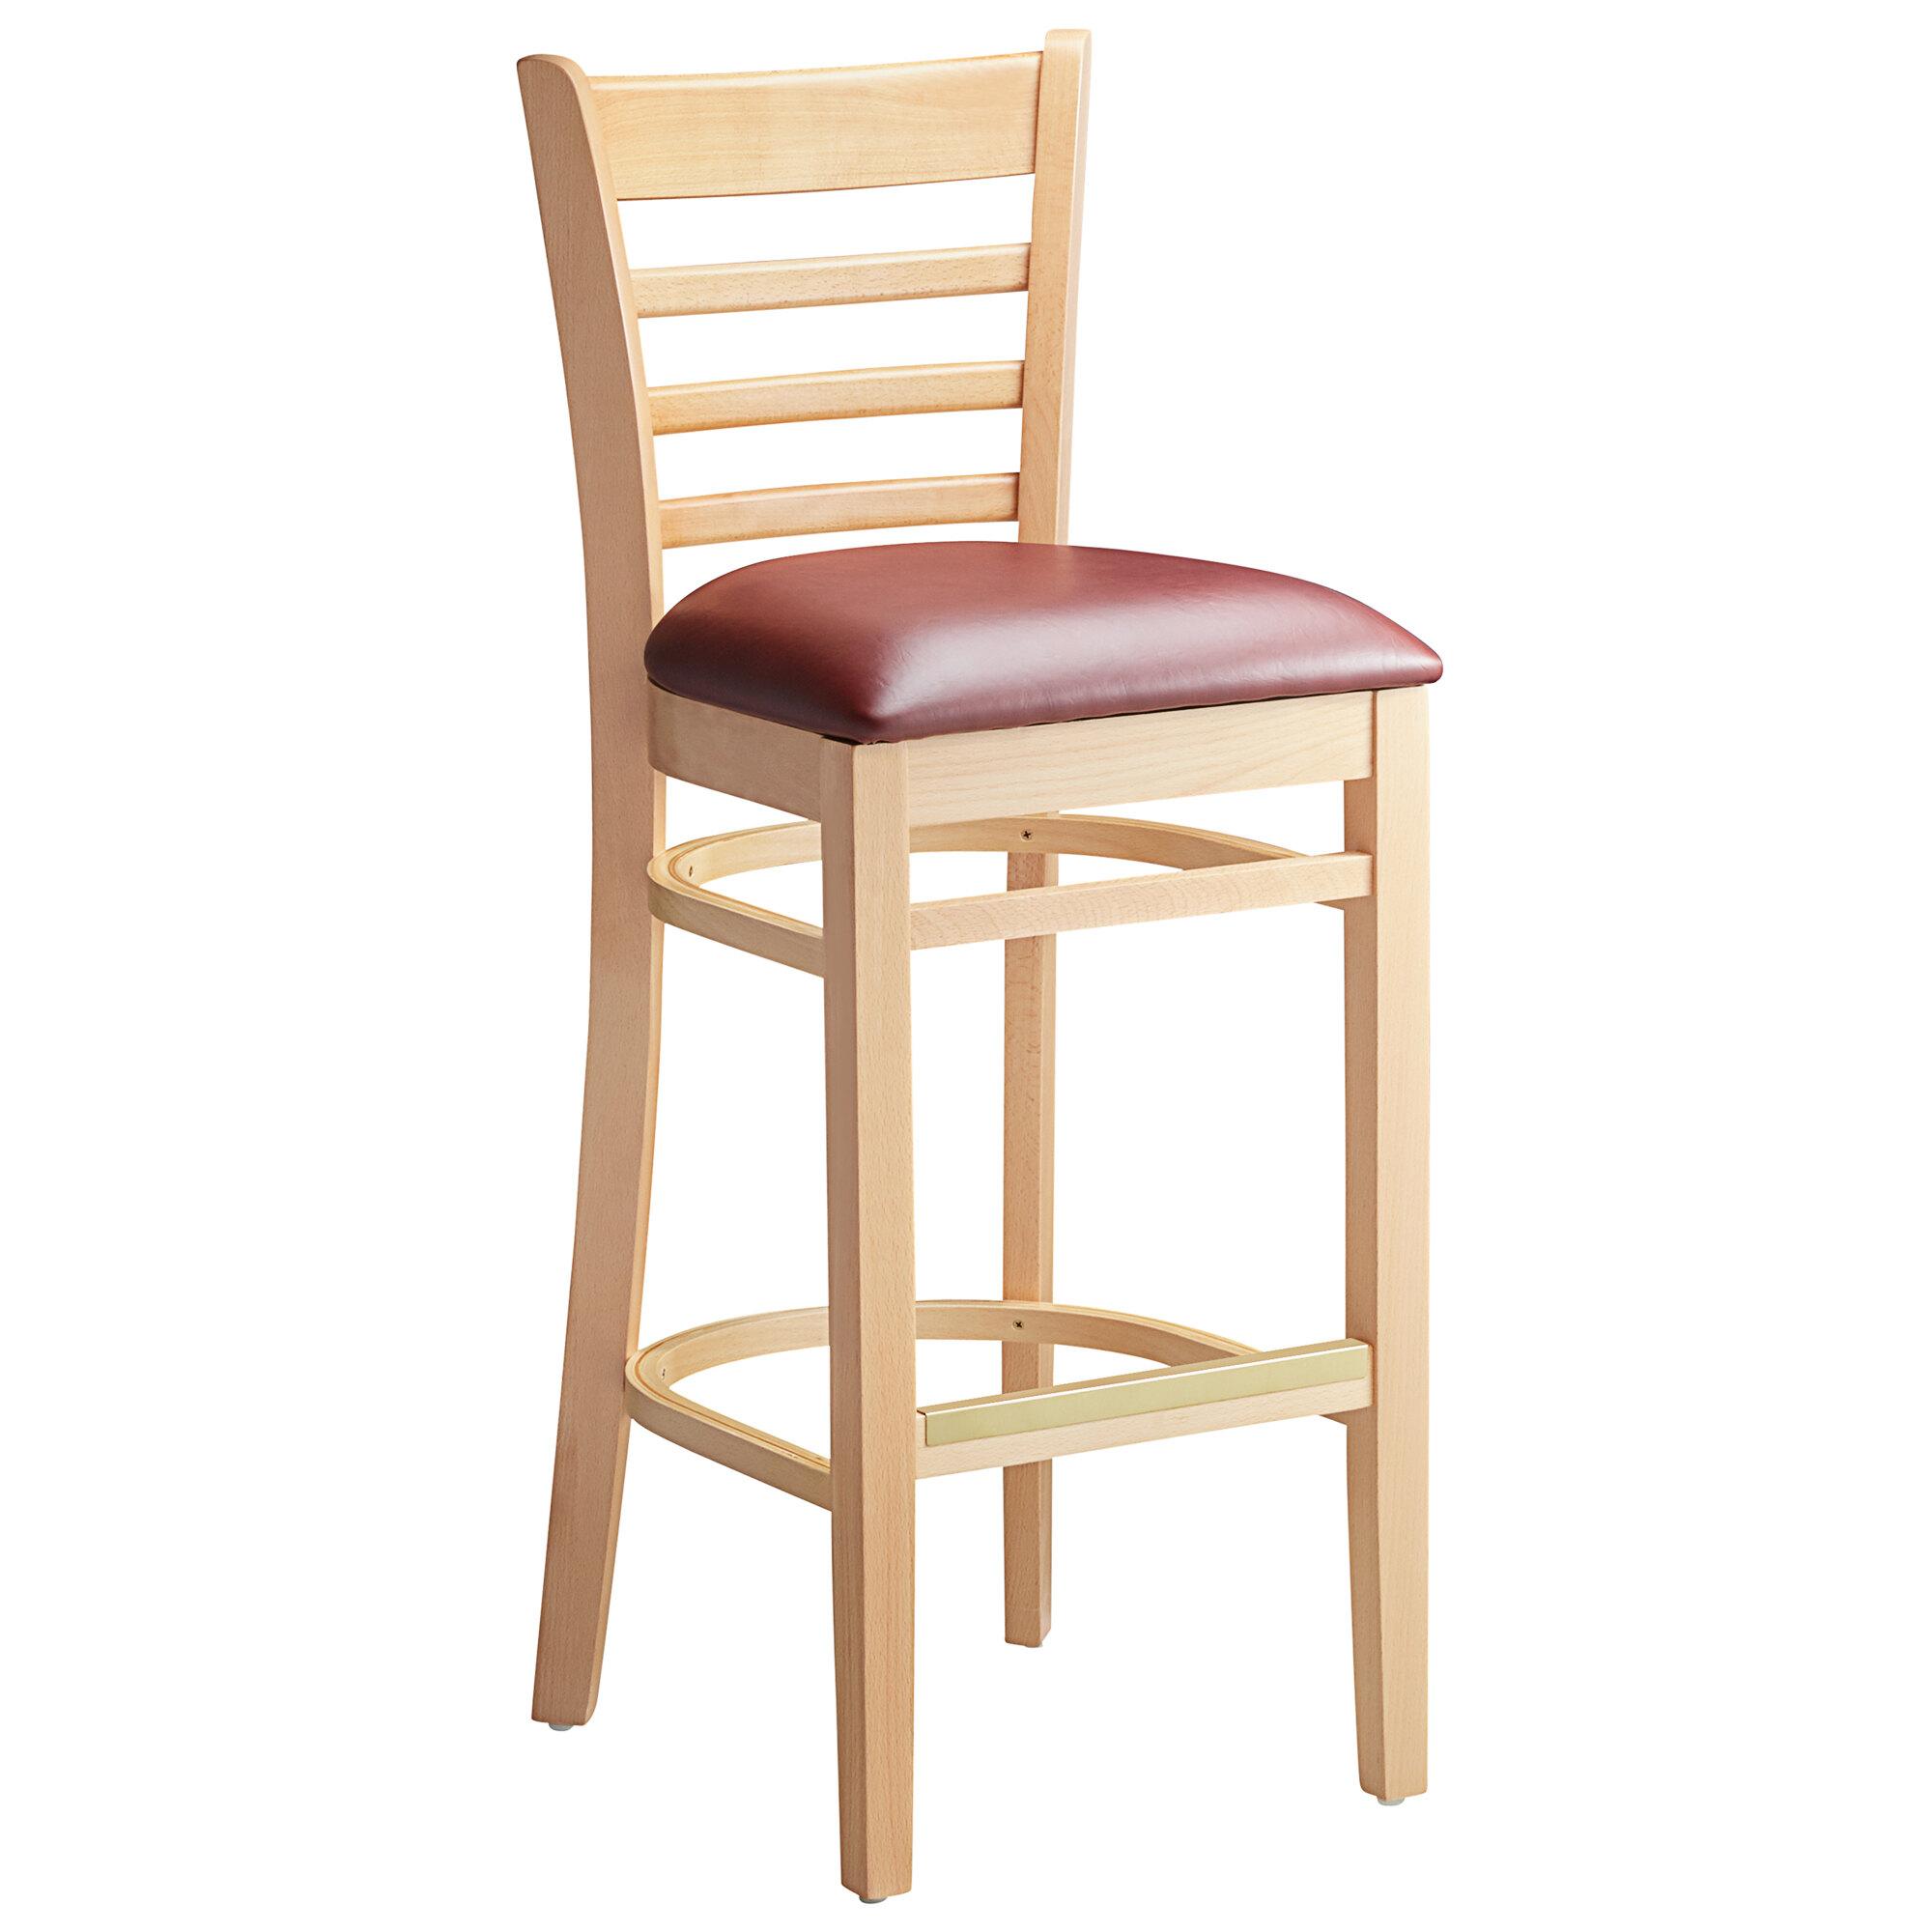 #72 - Natural Wood Finished Ladder Back Restaurant Barstool with Burgundy Vinyl Seat